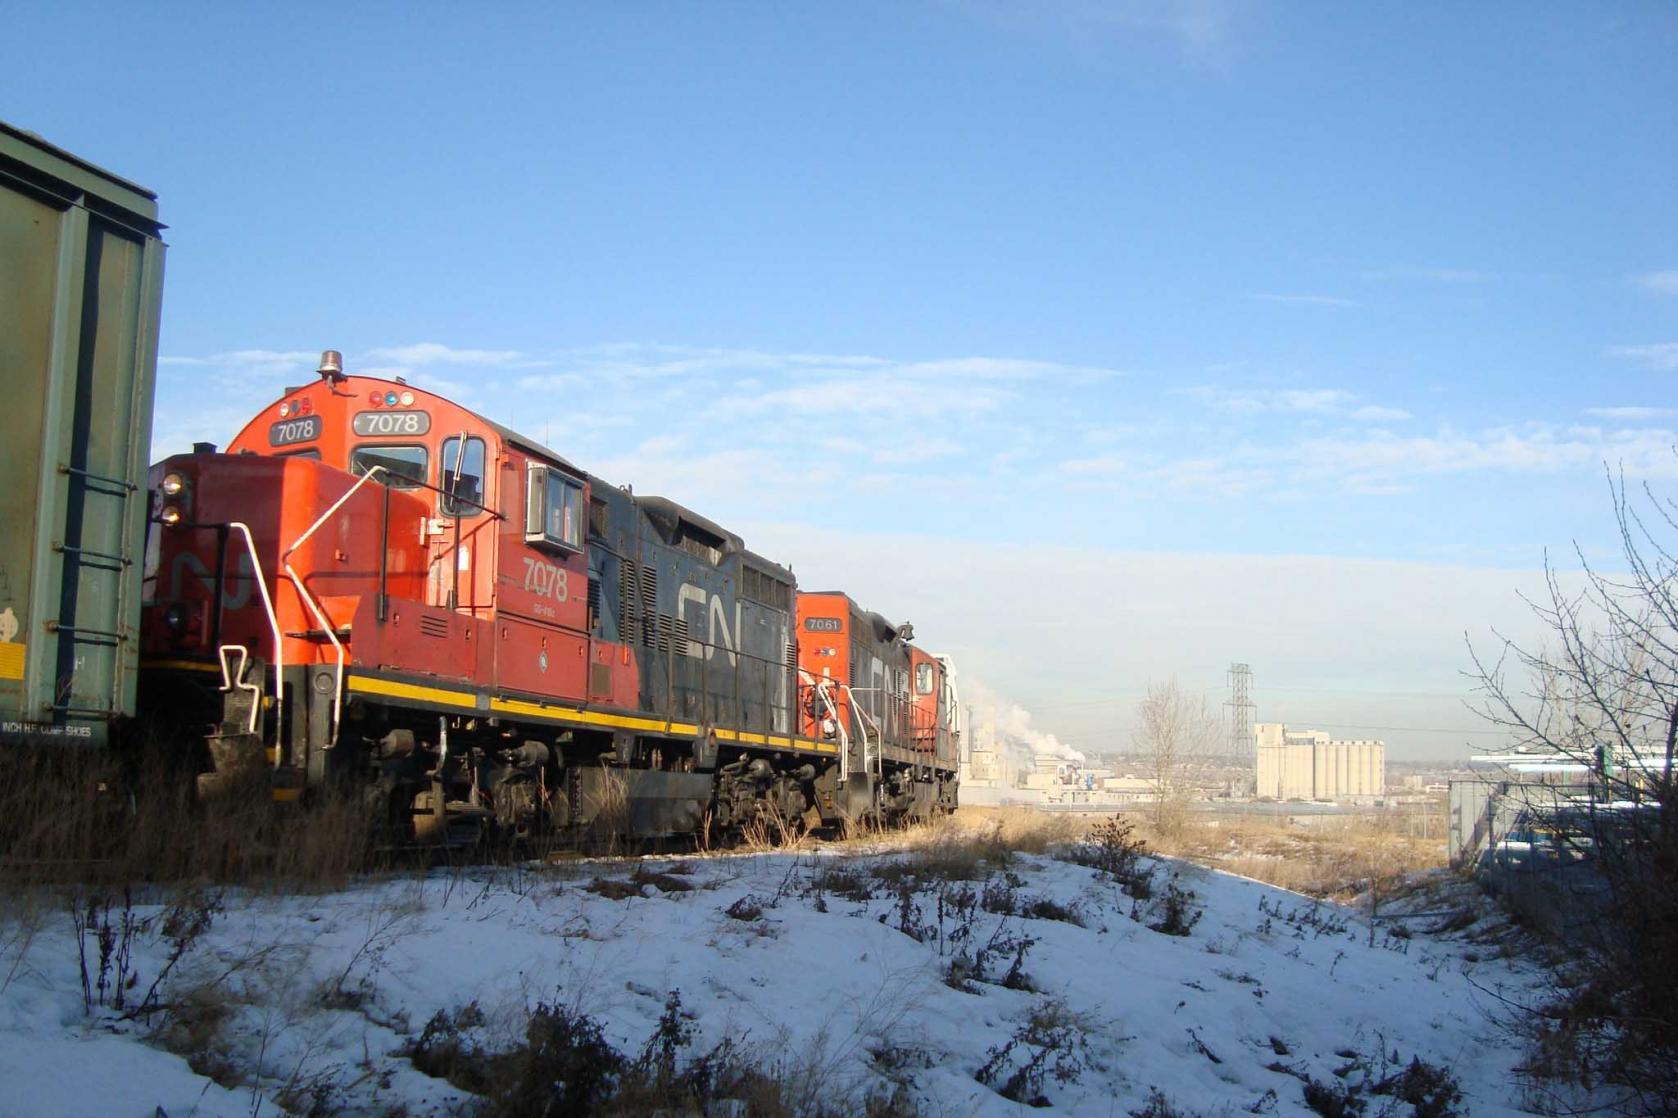 CN7078 & CN7061.jpg